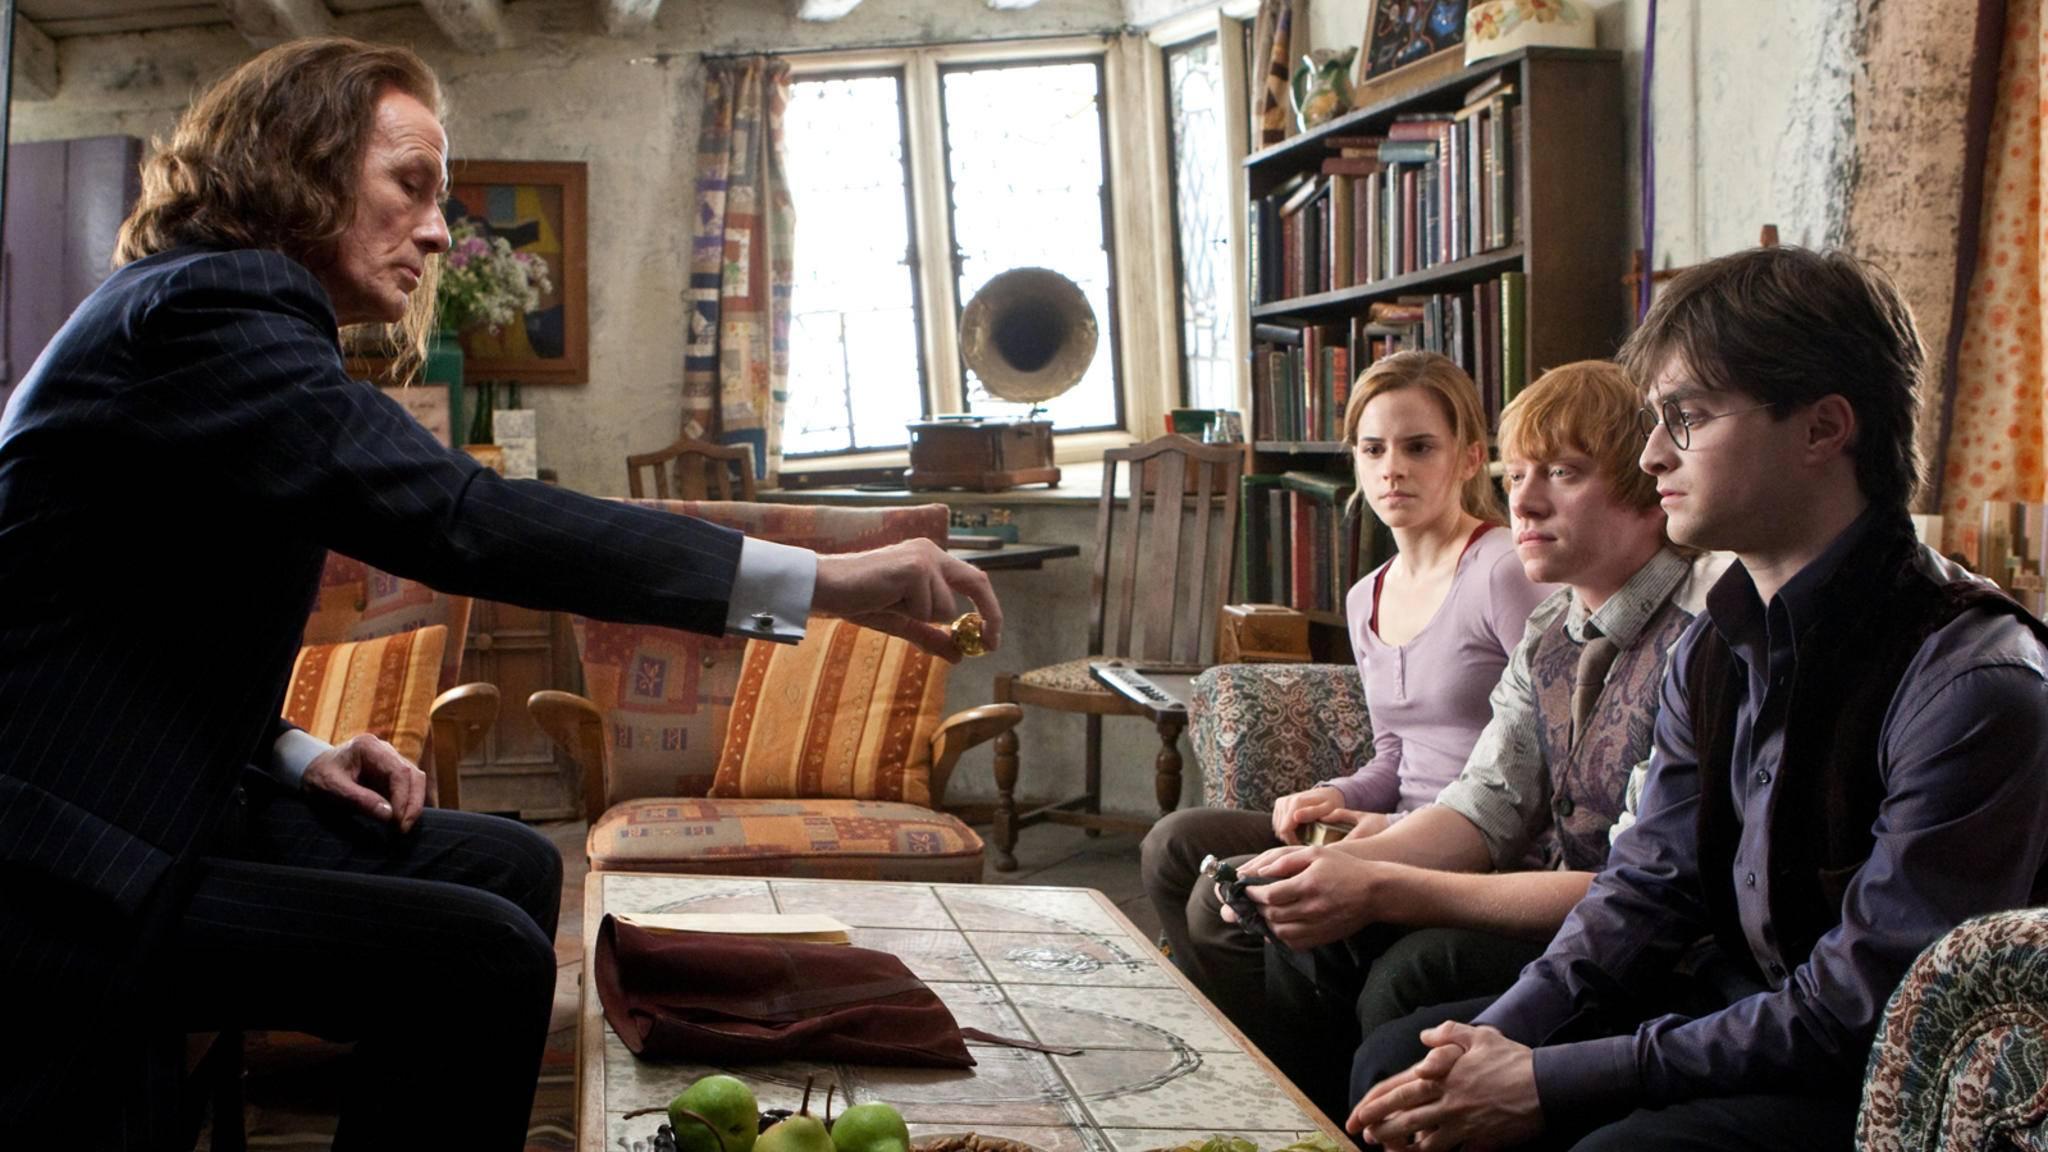 Harry Potter Heiligtuemer des Todes Teil 1 hermine granger ron weasley emma watson rupert grint daniel radcliffe